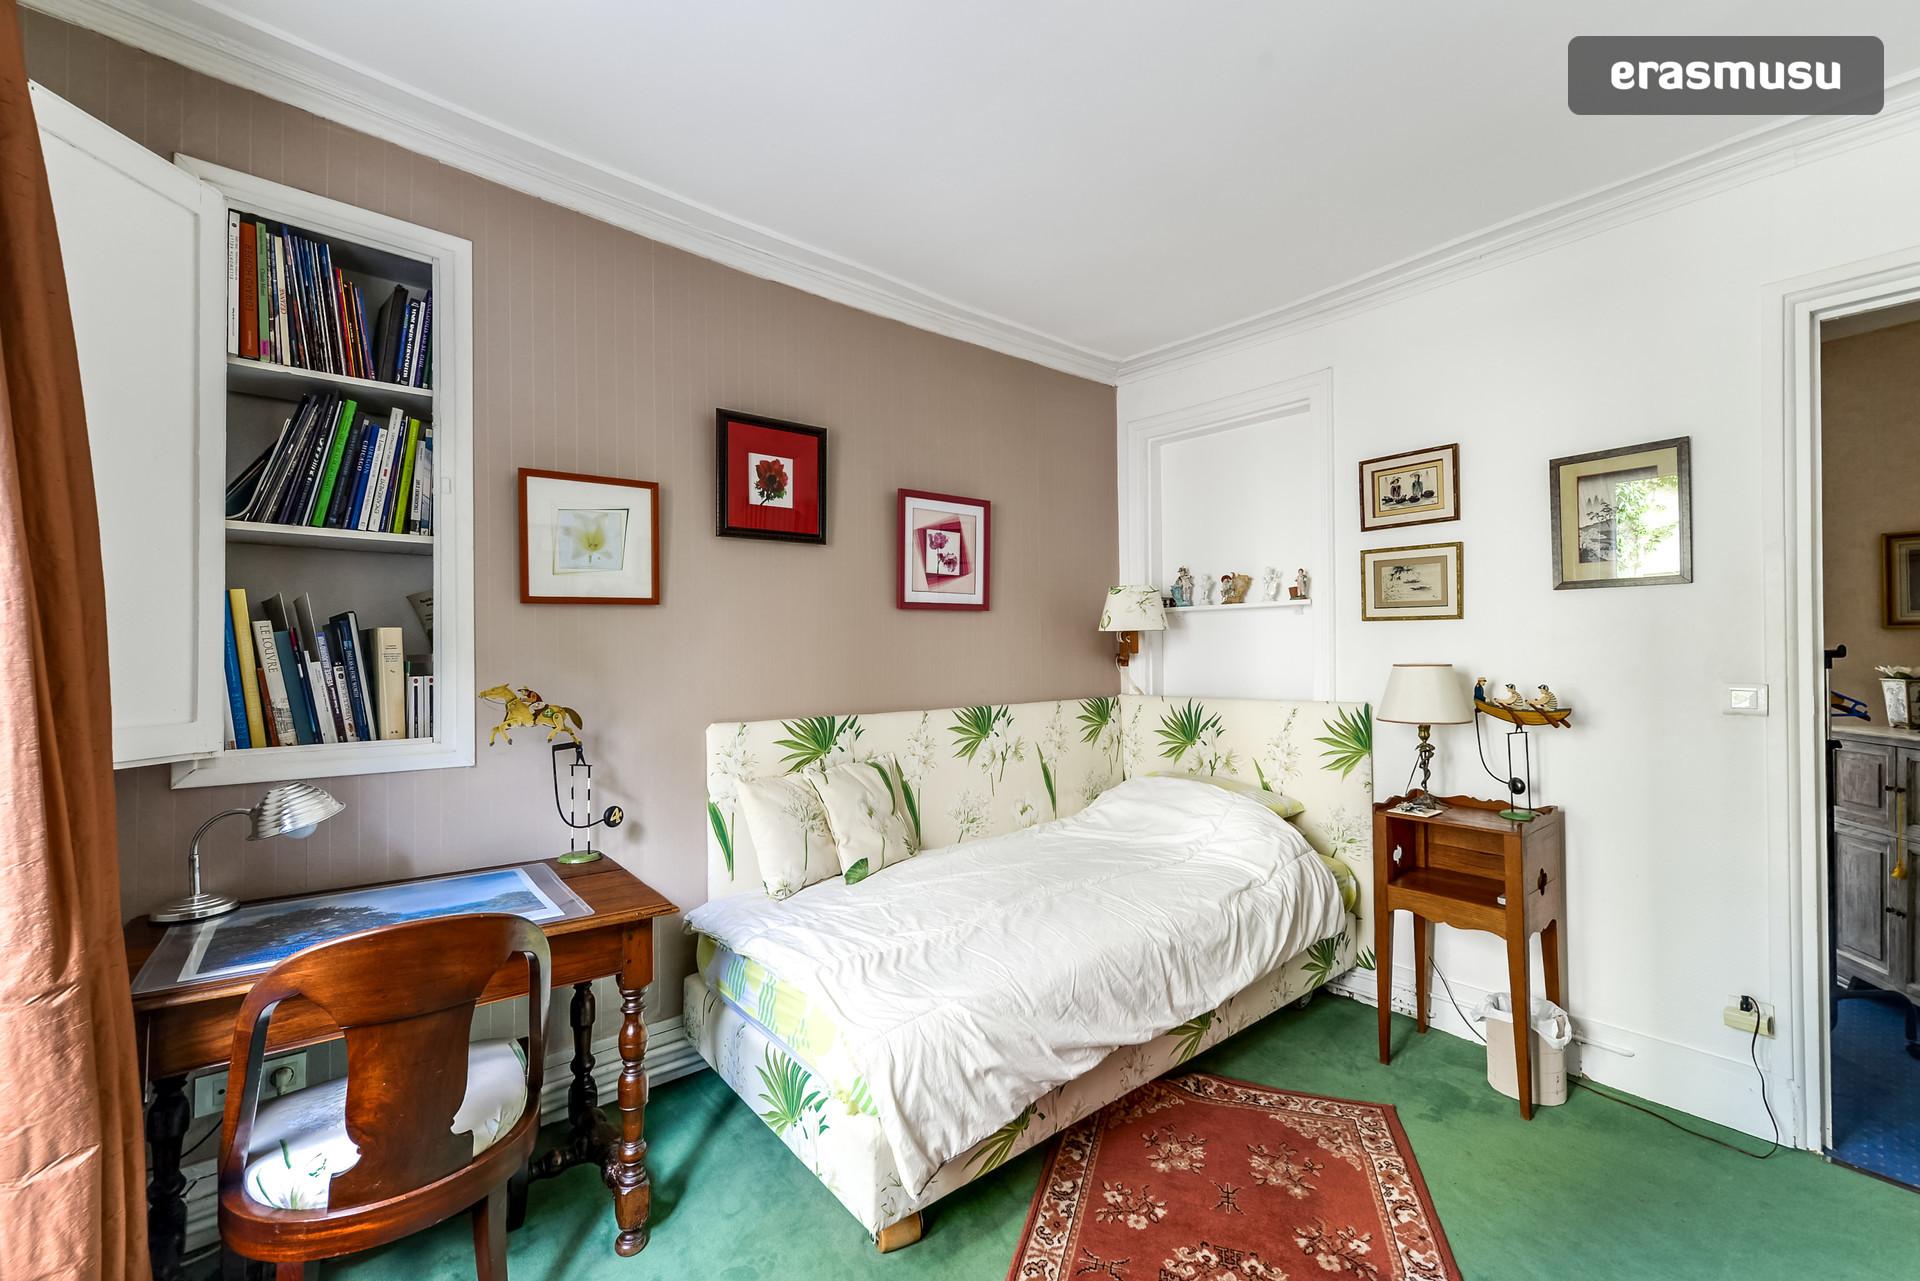 chambre individuelle avec salle de bain et toilette priv es single room with private bathroom. Black Bedroom Furniture Sets. Home Design Ideas